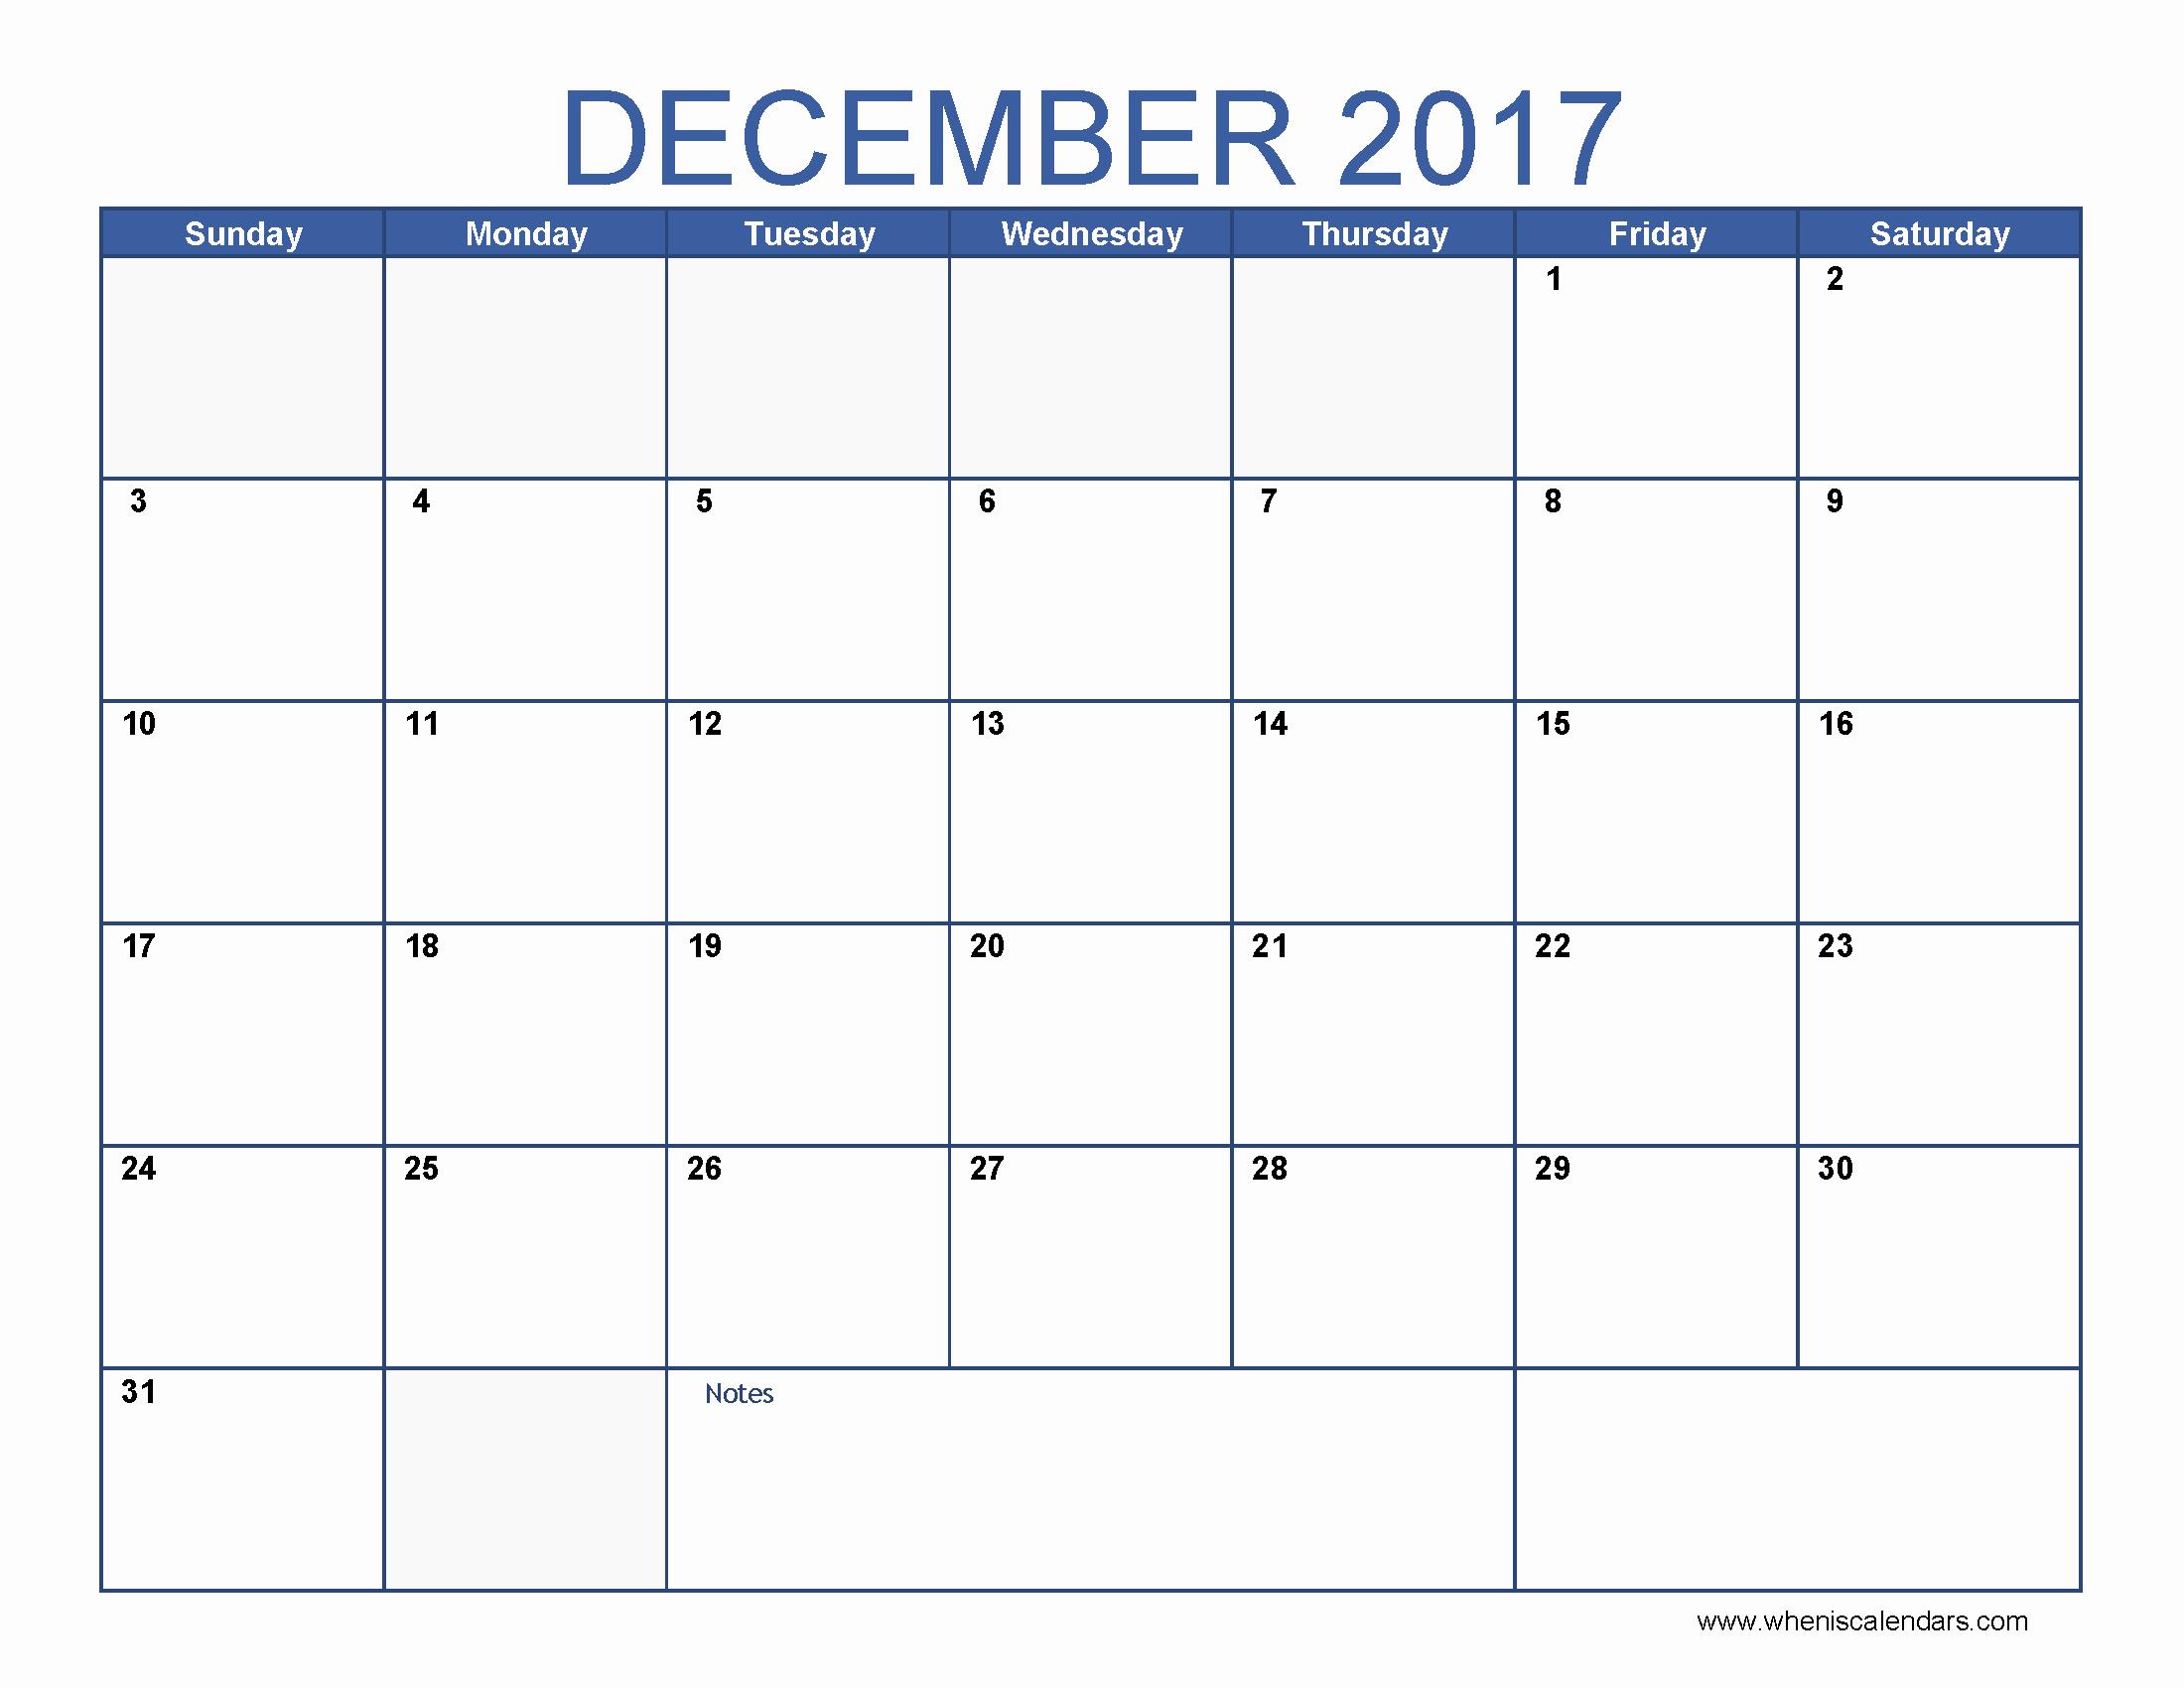 12 Month 2017 Calendar Printable Elegant December 2017 Printable Calendar